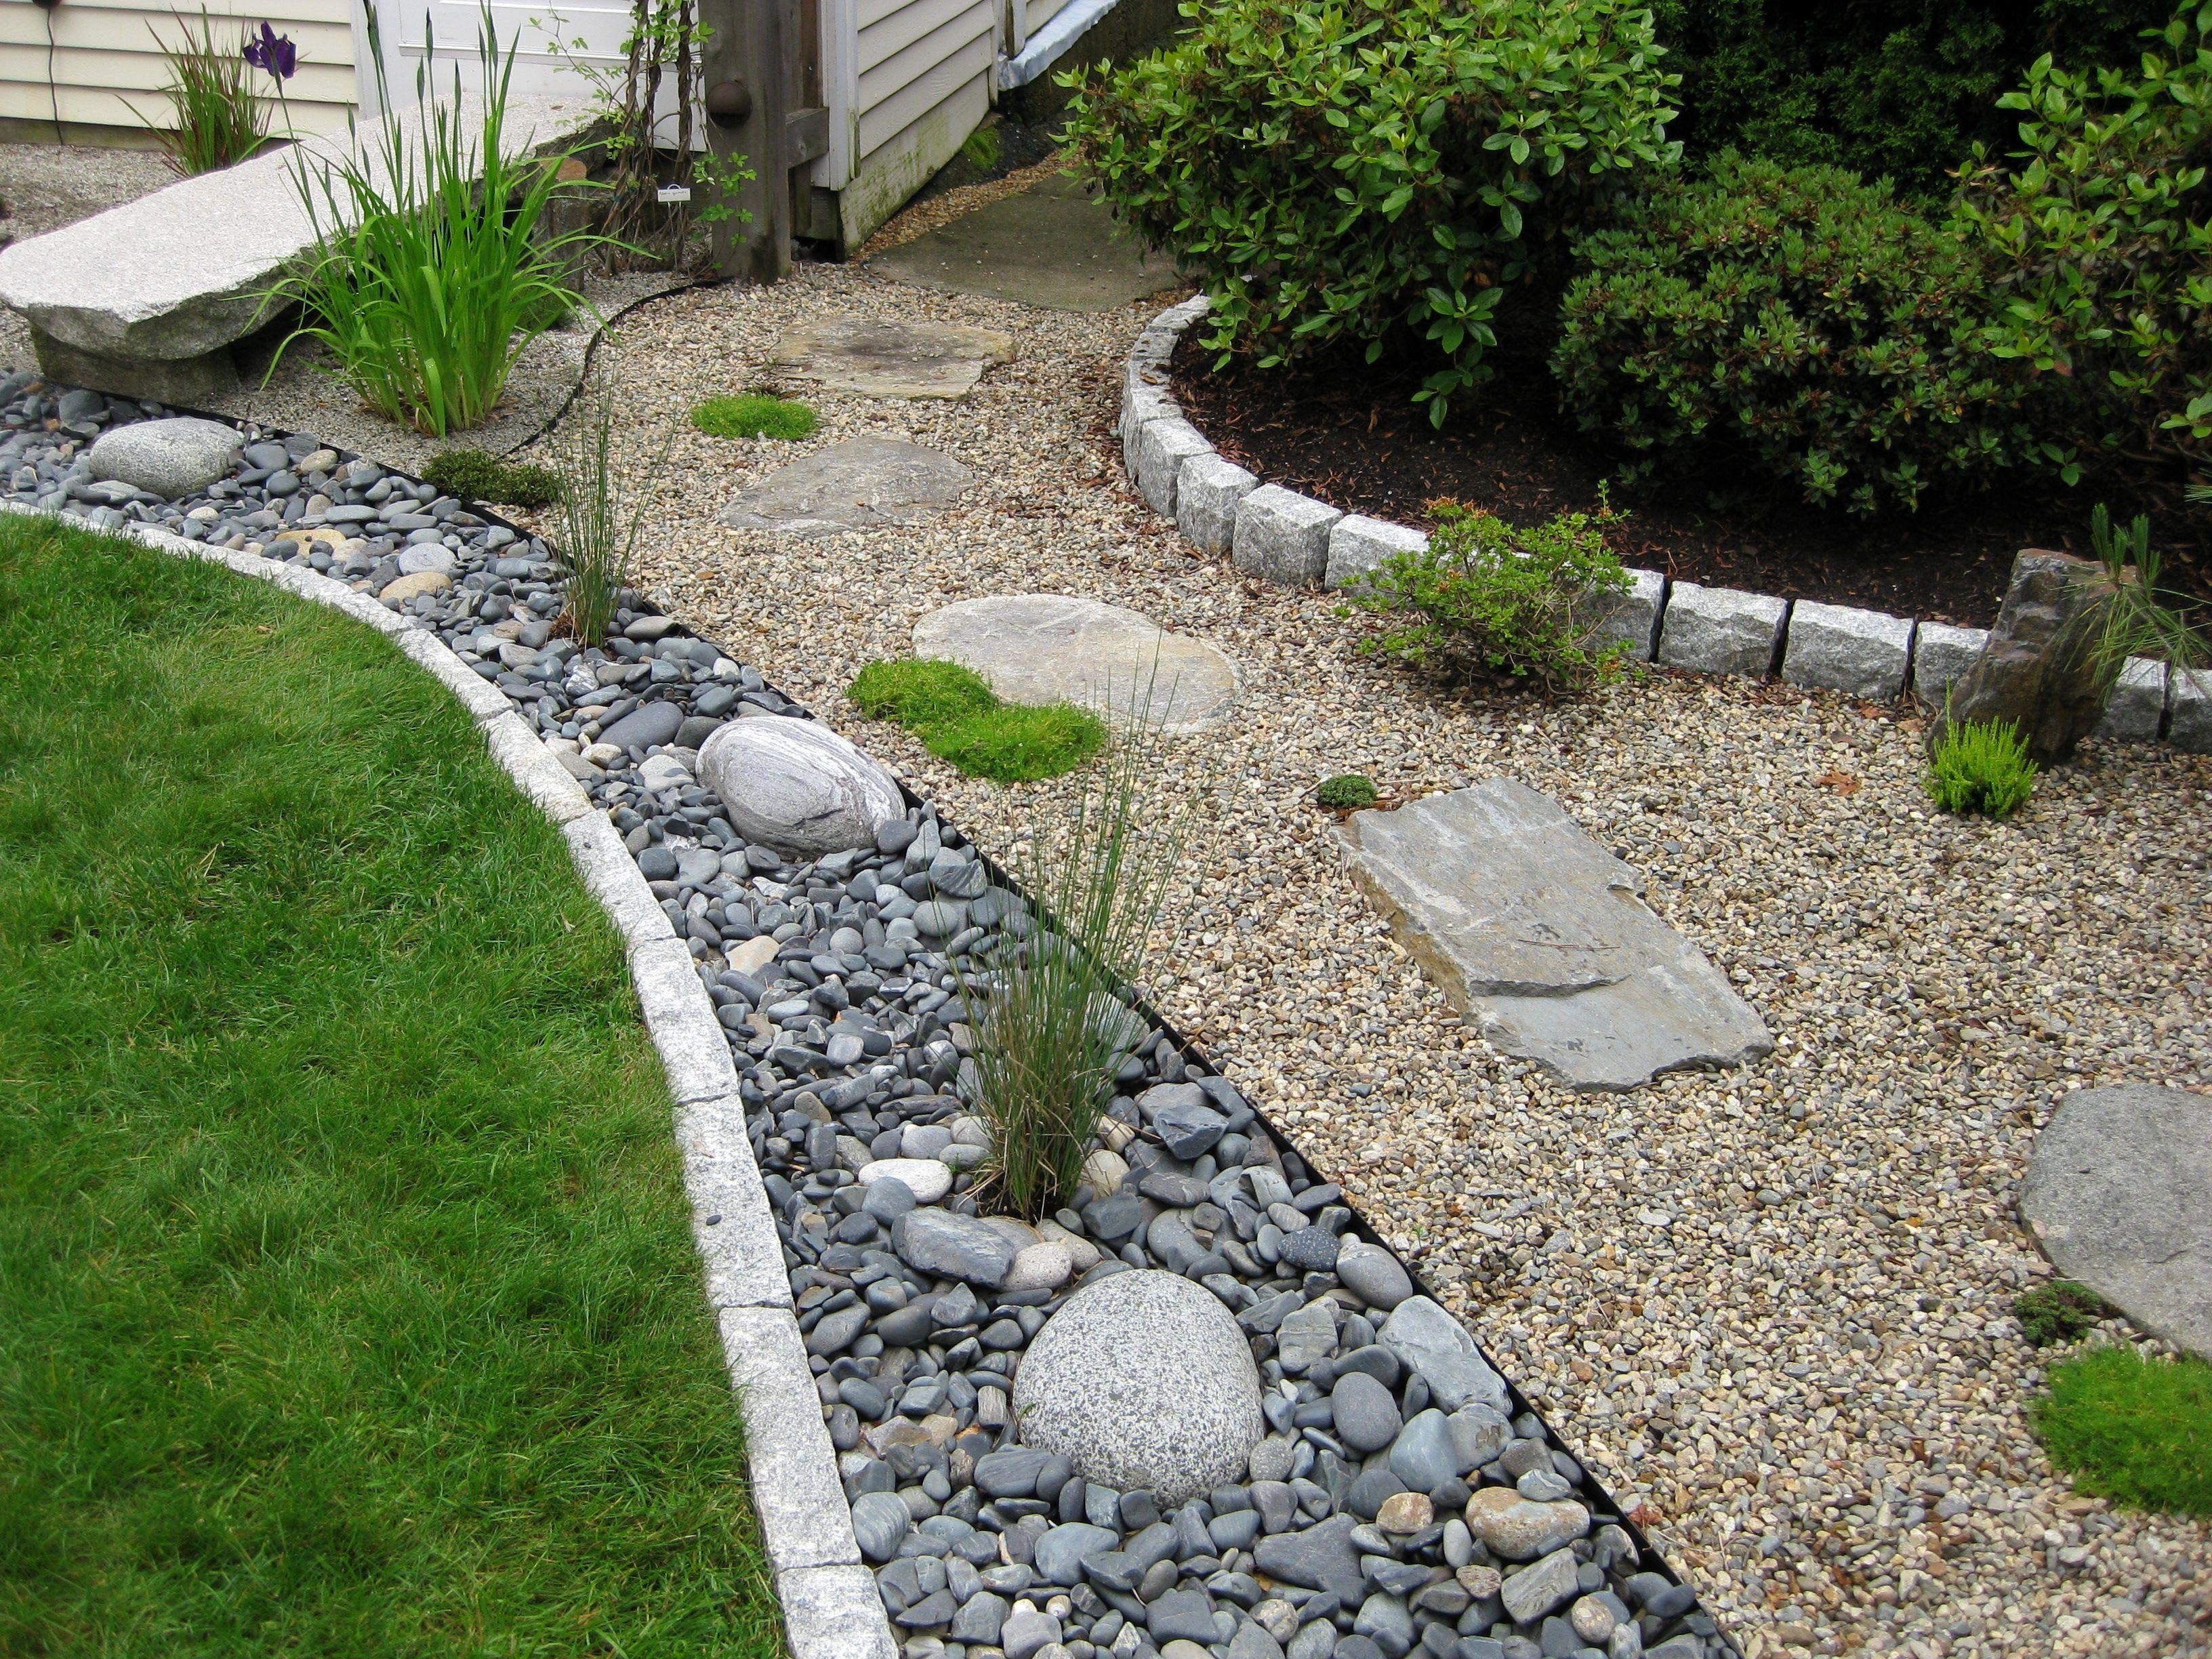 Dry Garden Design Talentneeds Com Dry Garden Design Garden Landscape Design Landscaping With Rocks